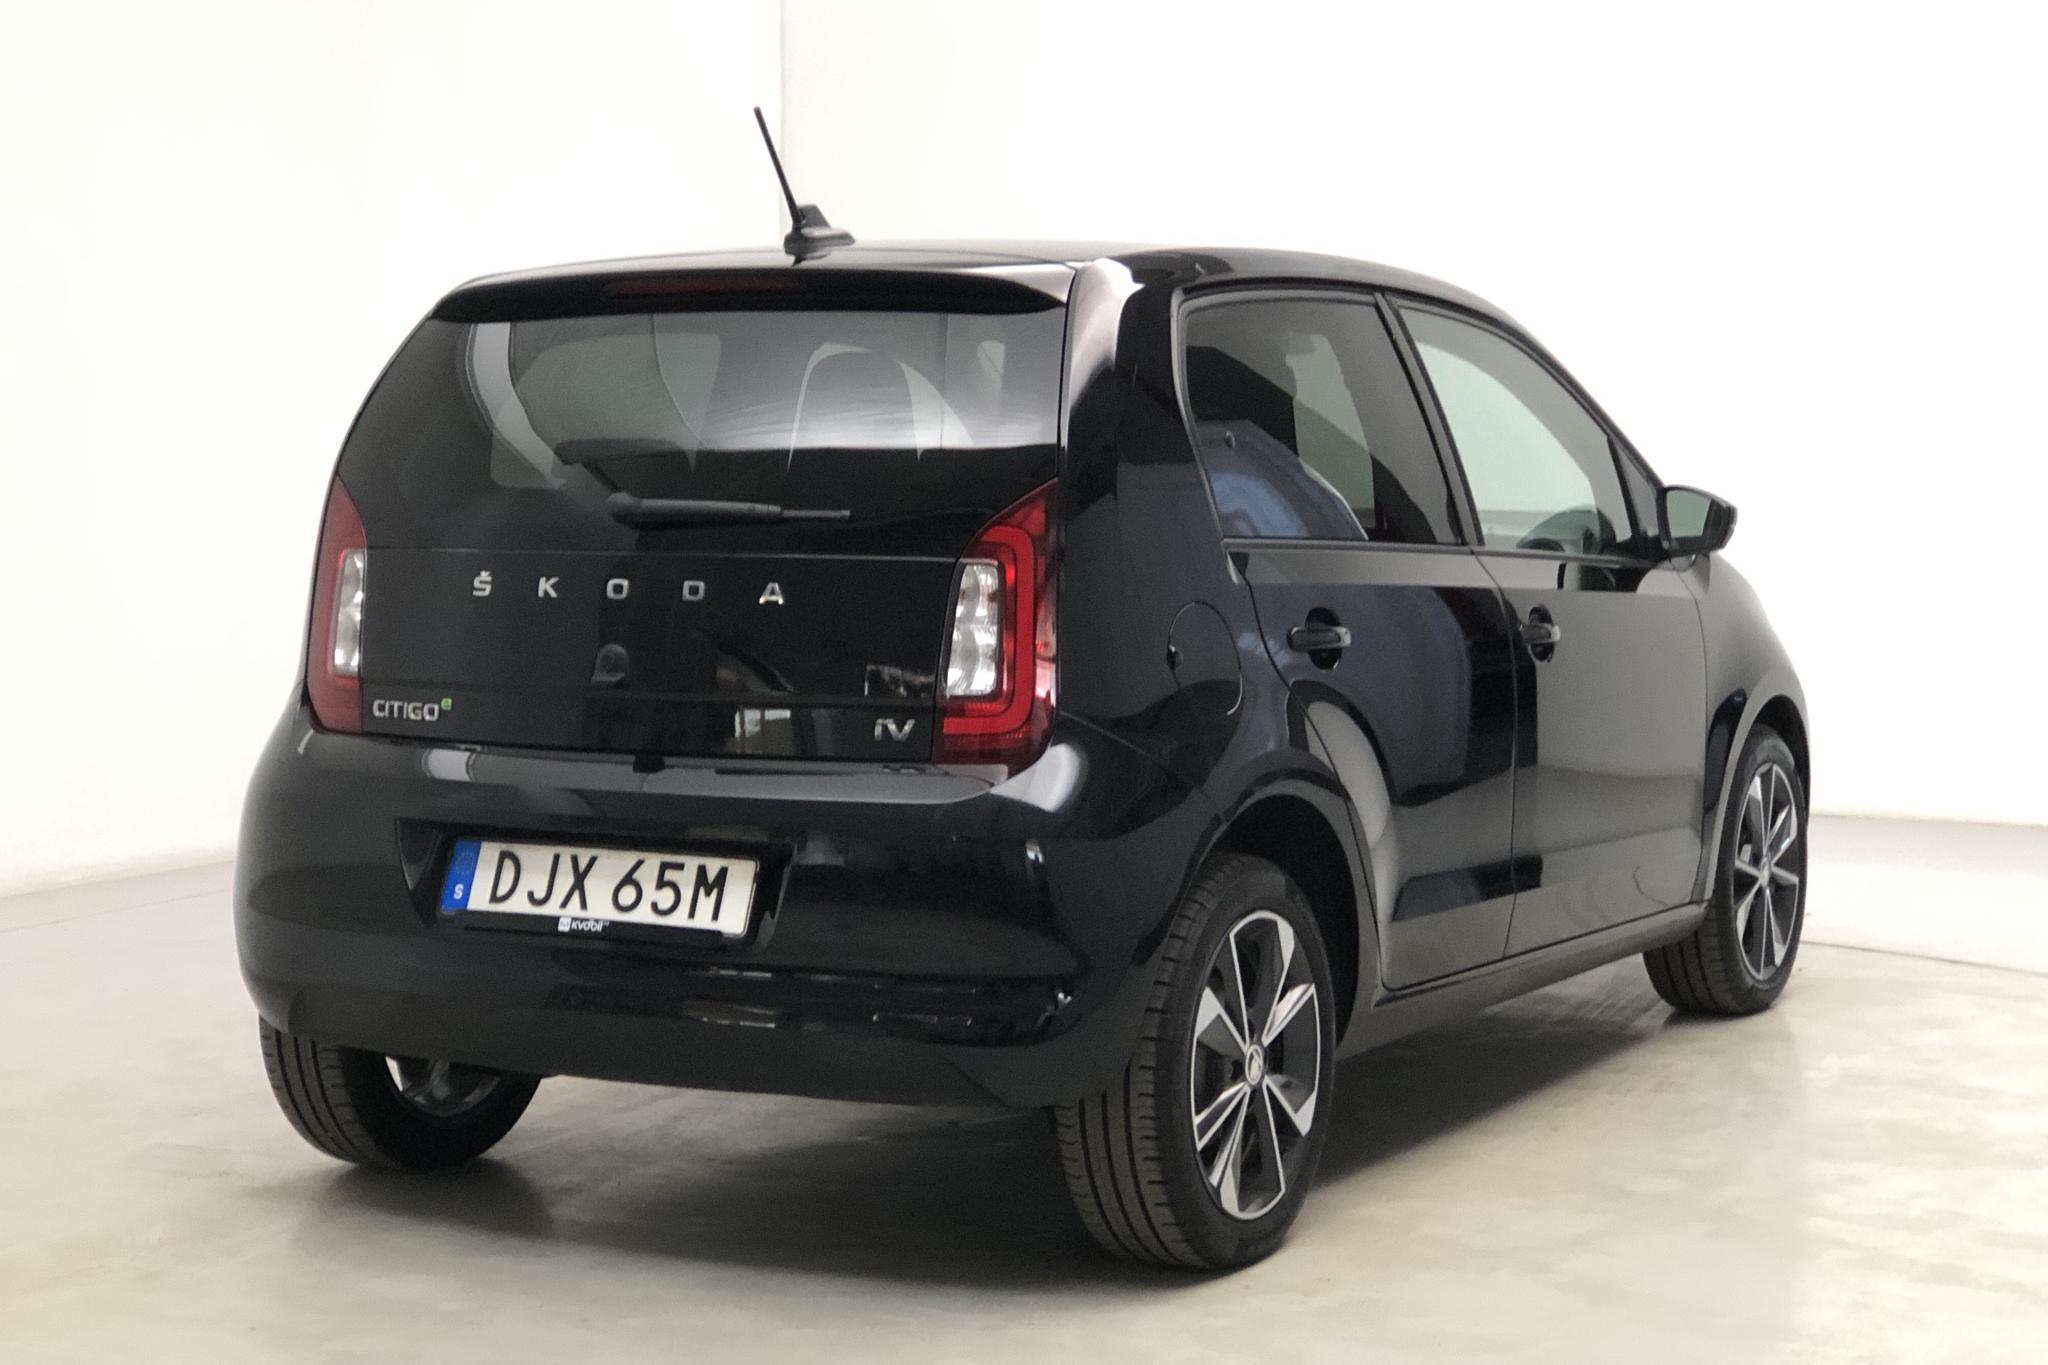 Skoda CITIGOe iV 36,8 kWh (83hk) - 2 584 mil - Automat - svart - 2020